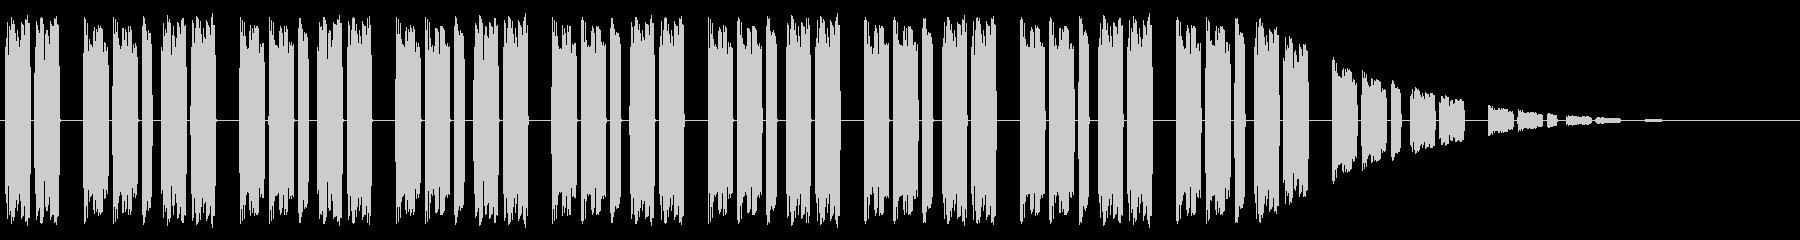 NES STG C07-5(パワーアップの未再生の波形